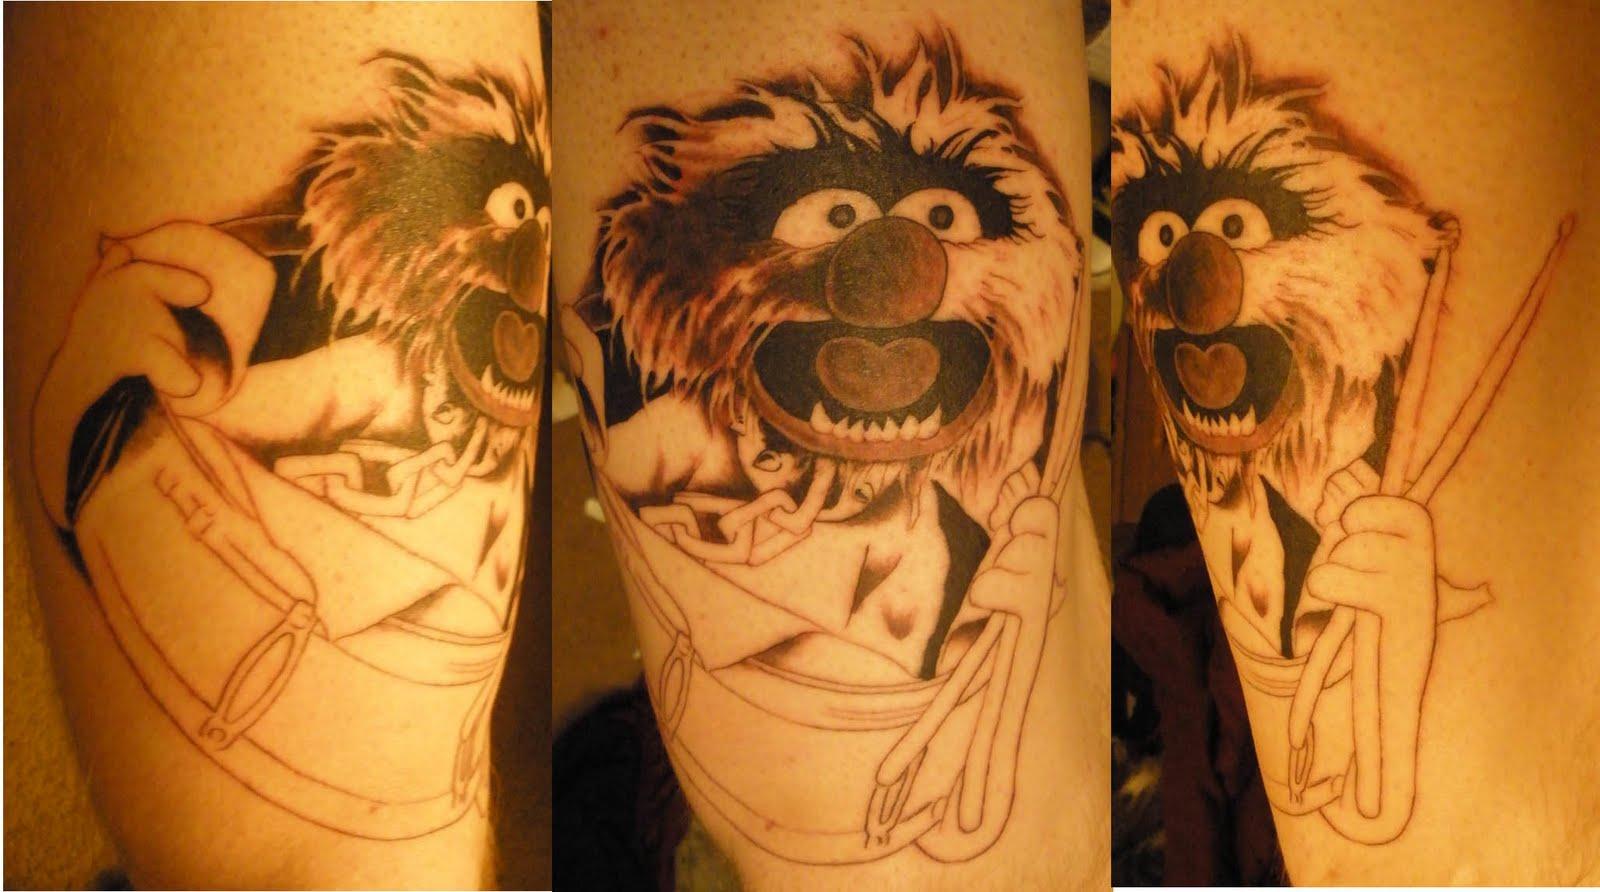 http://3.bp.blogspot.com/_GCRwju3ii8Y/TOeWD0GSGcI/AAAAAAAAAX8/0w2qKDCvl00/s1600/Animal_Muppet_Tattoo_by_pisopez.jpg